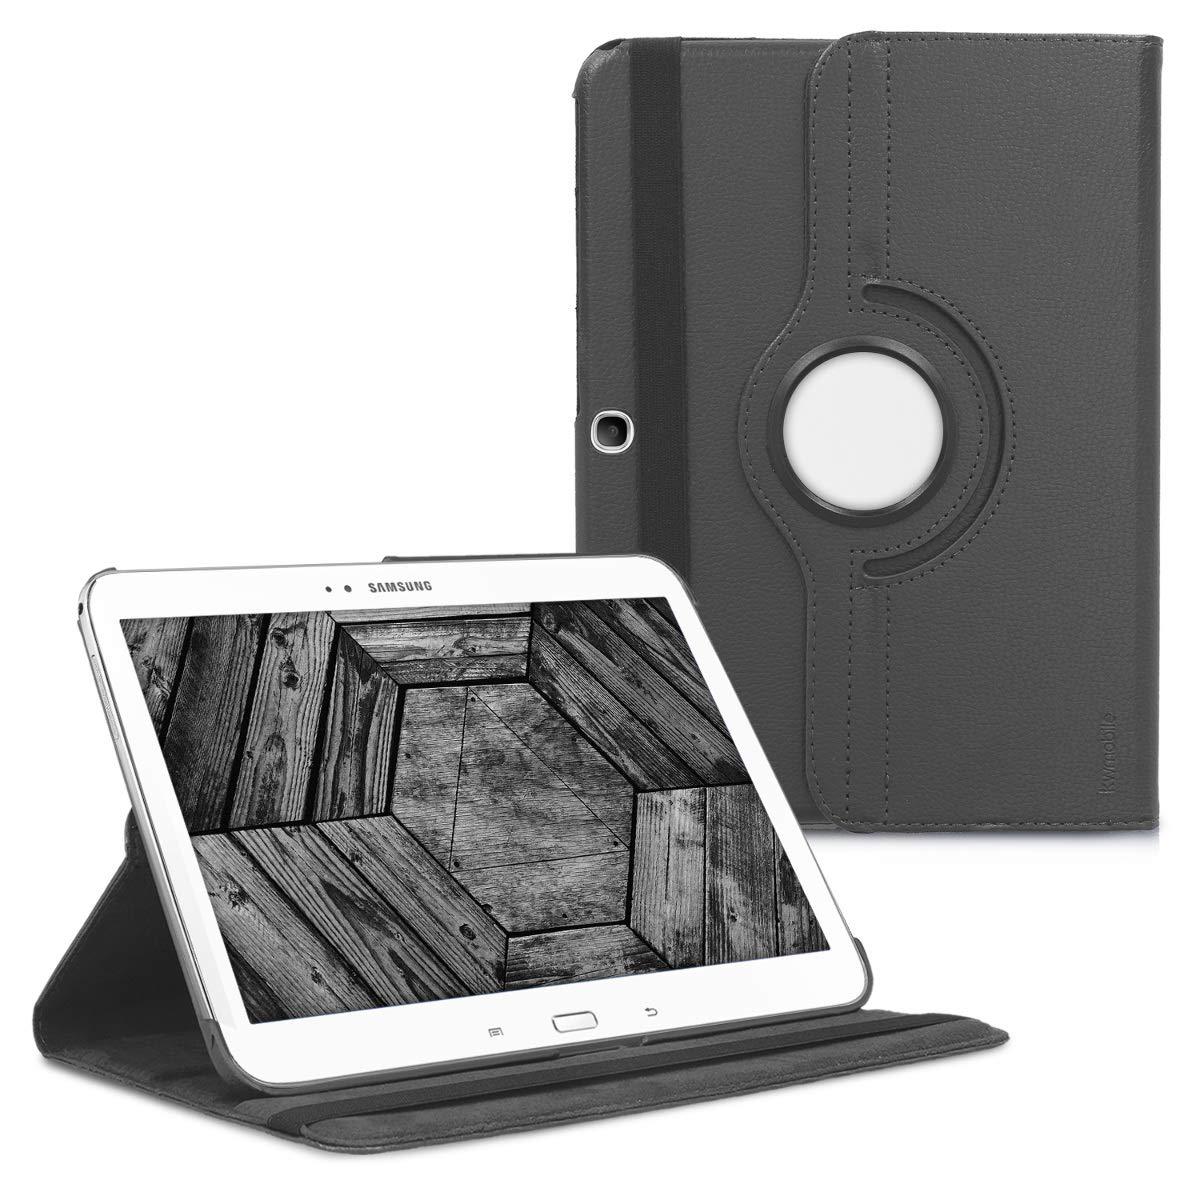 Funda Samsung Galaxy Tab 3 10.1 KWMOBILE [7D2H9HF8]